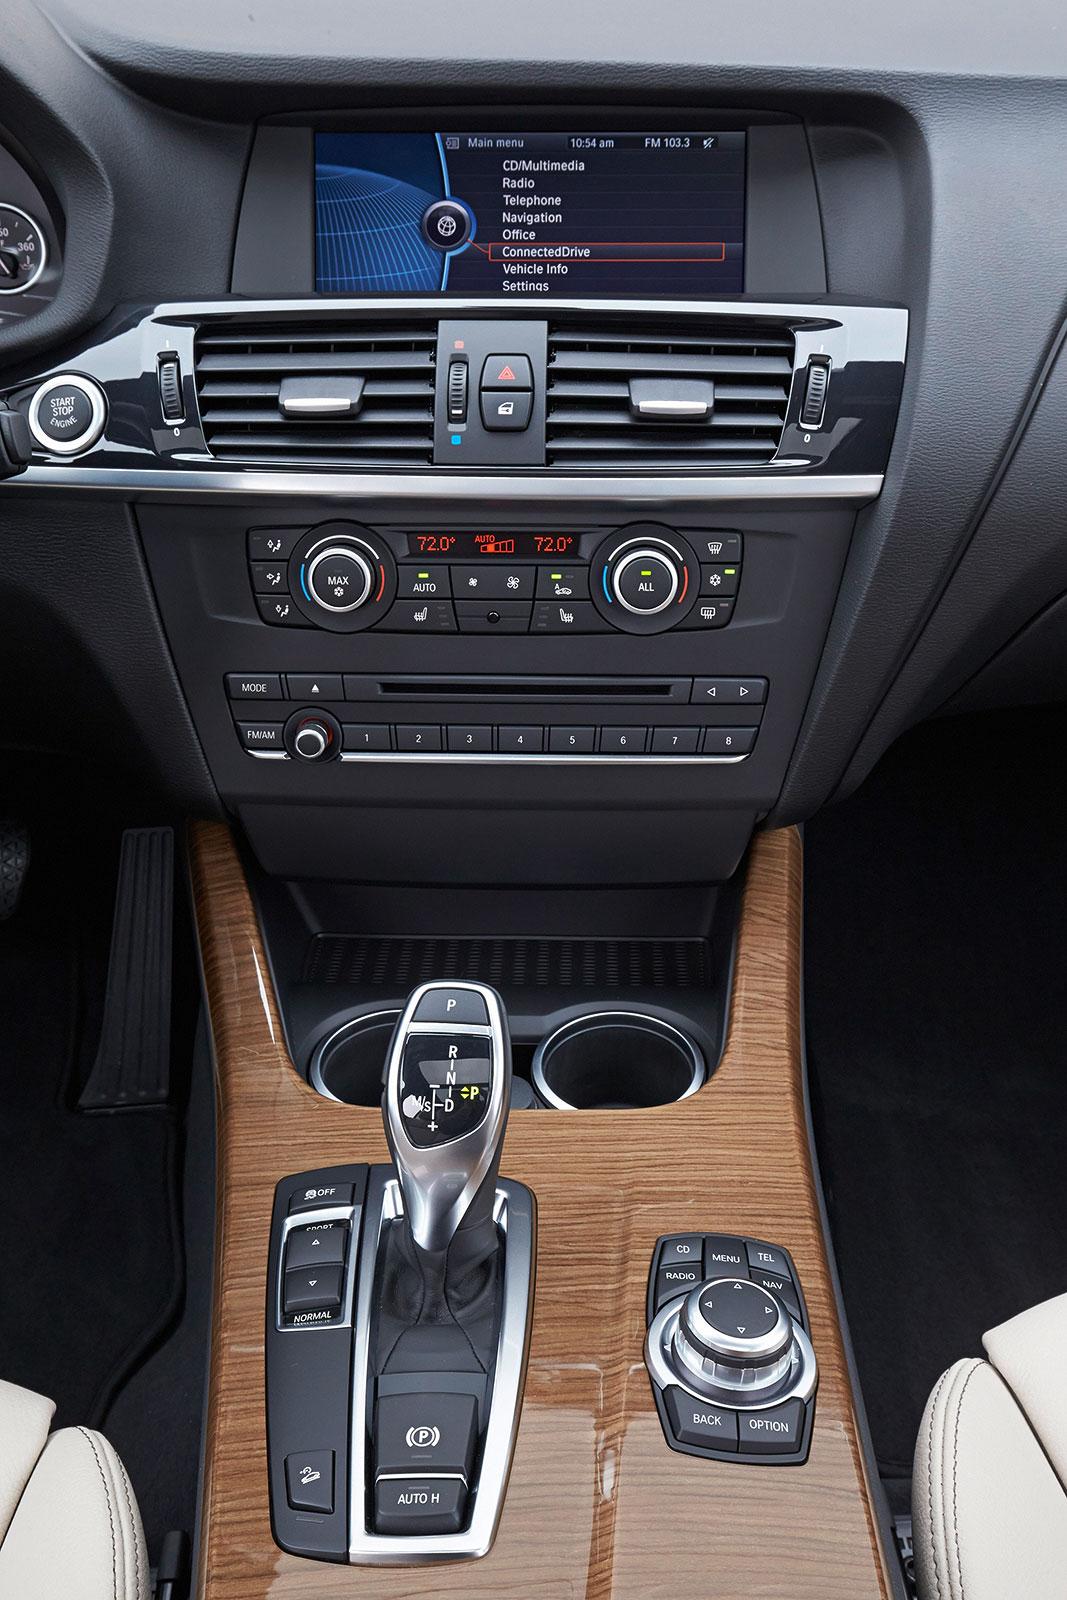 Foto: BMW X3, 2. Generation, Modell F25, Interieur, Mittelkonsole ...